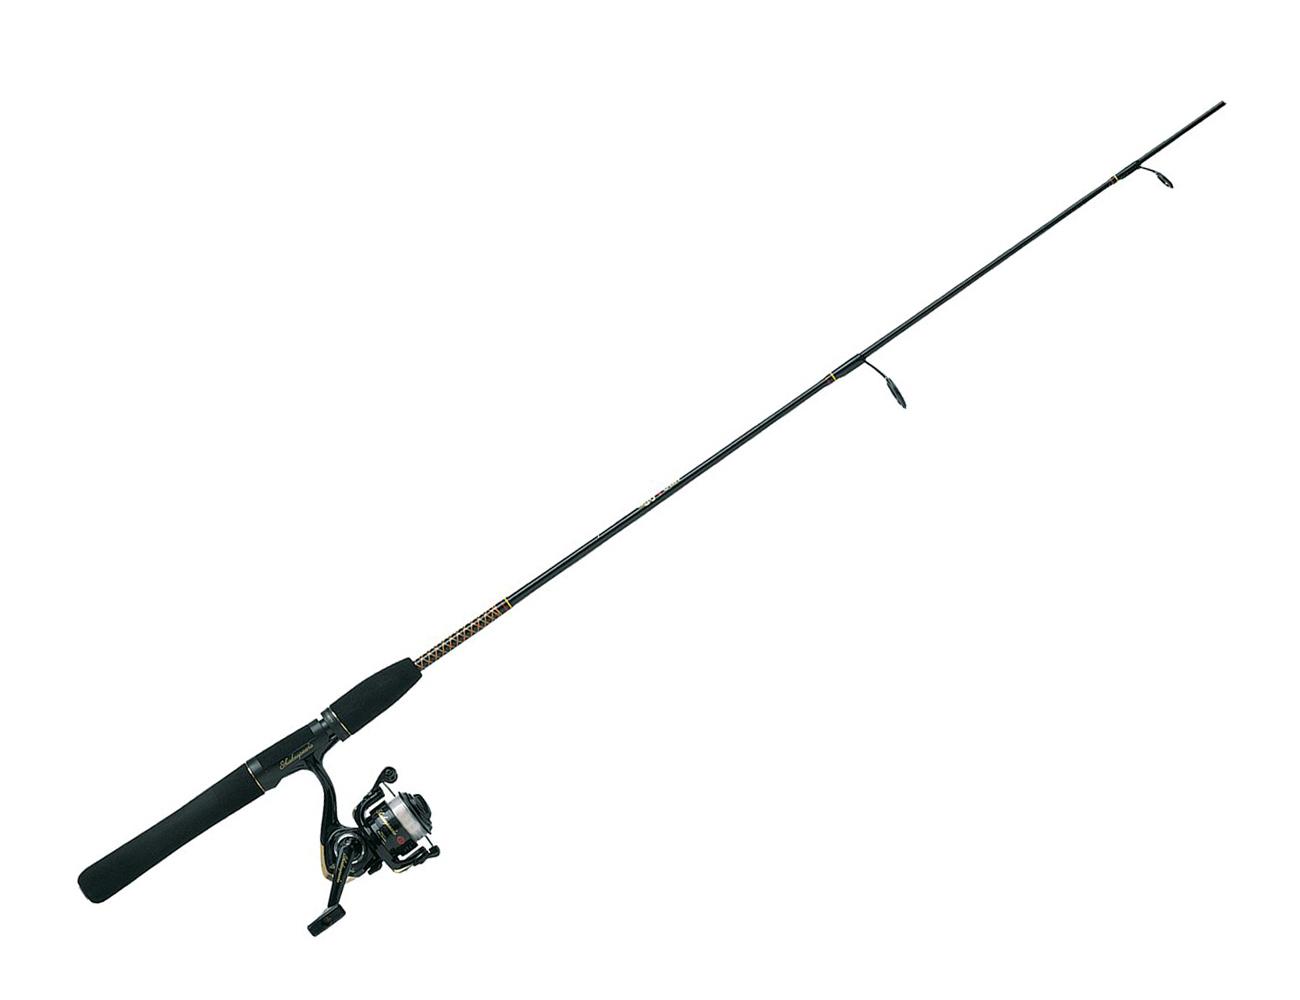 Fishing pole fishing rod clipart kiaavto 2 image